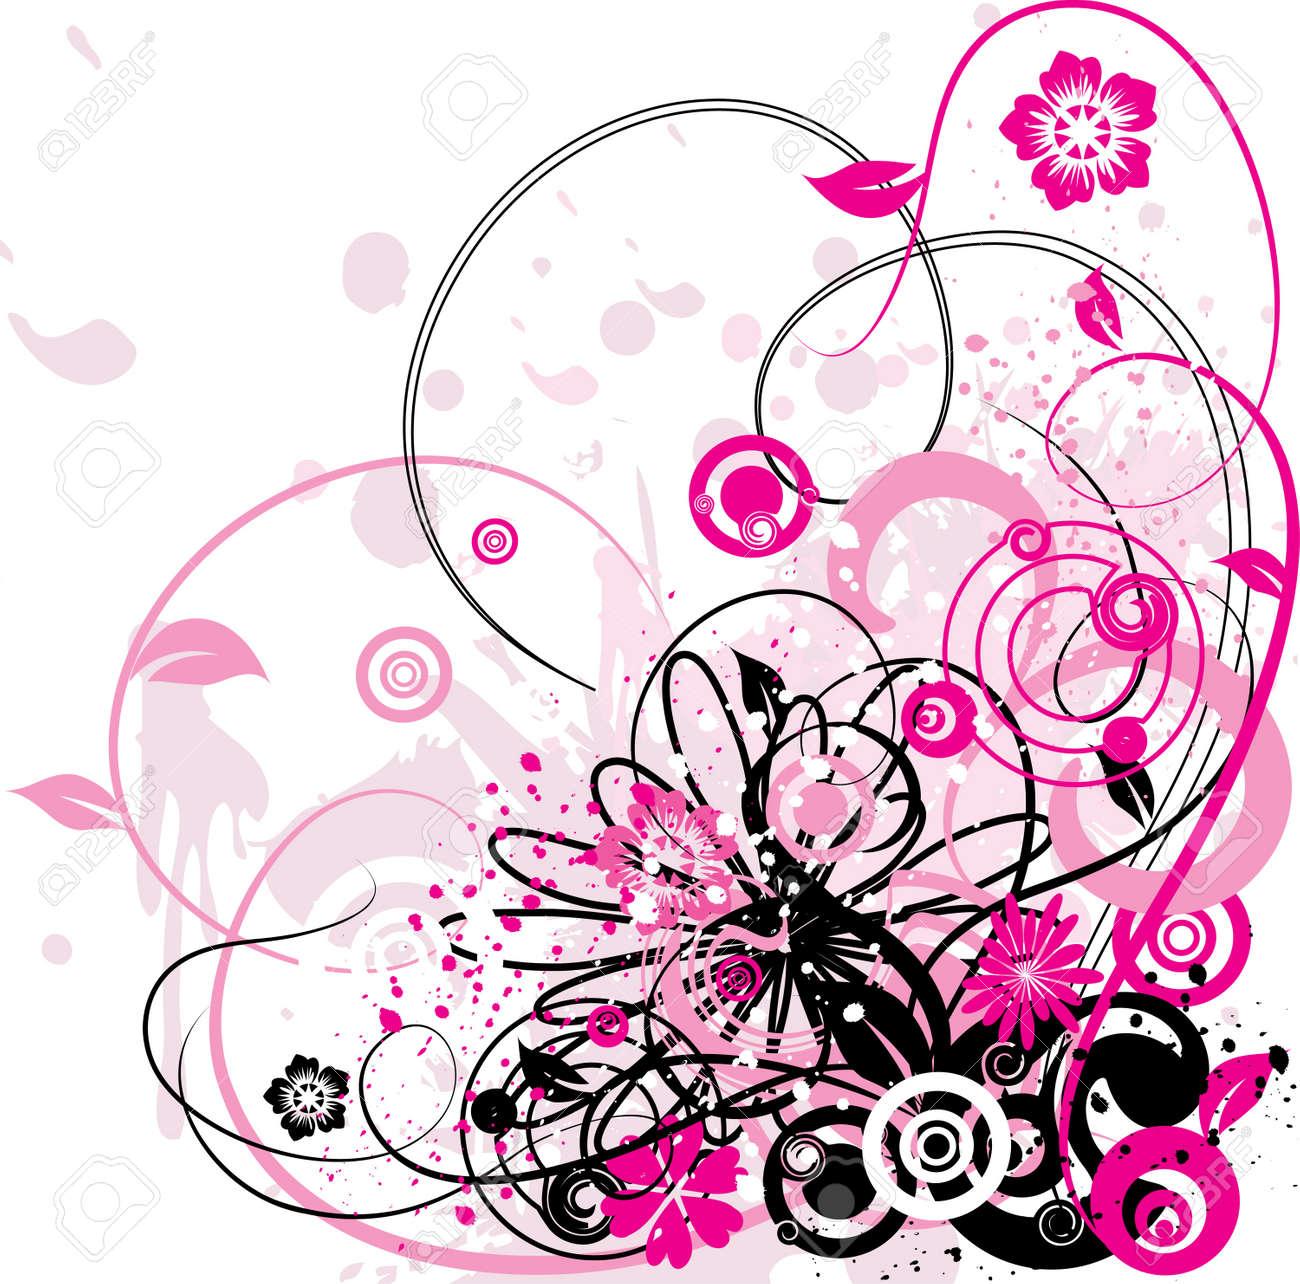 Grunge floral background, vector illustration Stock Photo - 884203